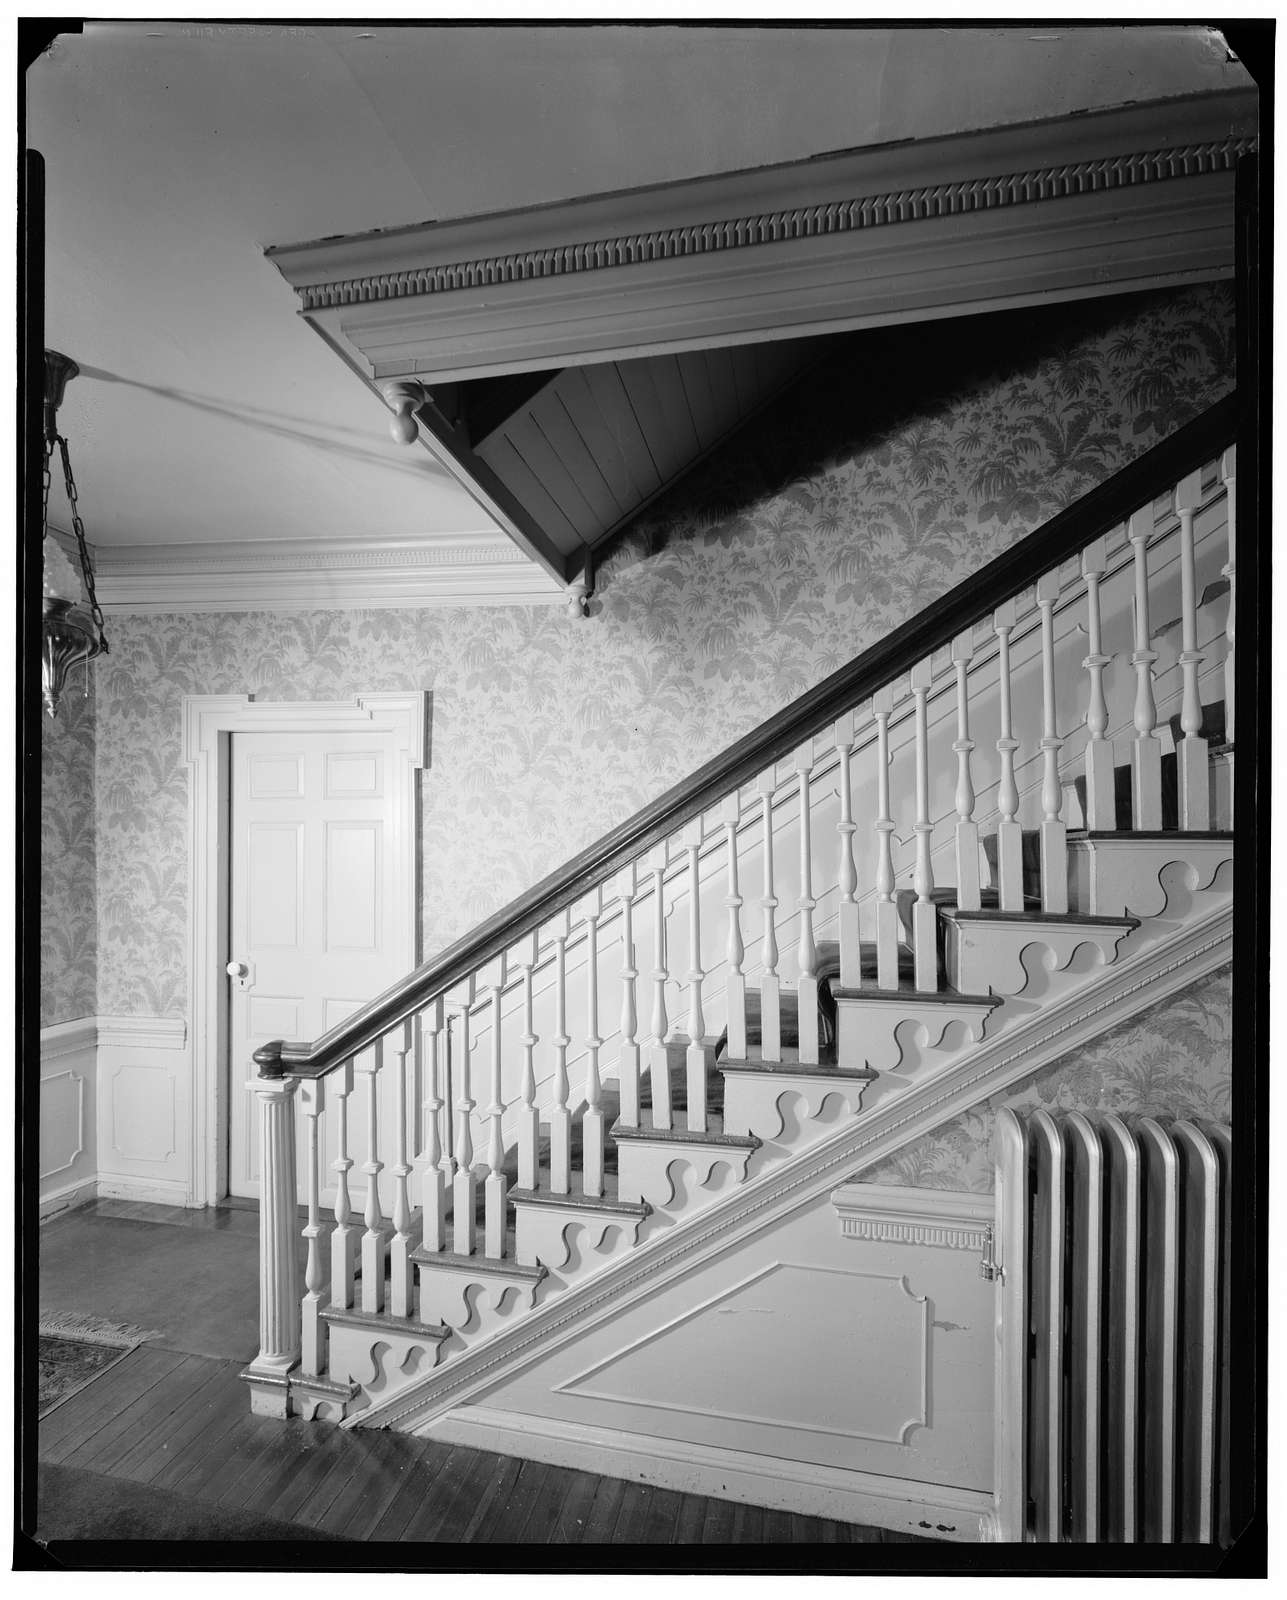 Bliss-Ruisden House, 606 Main Street, Warren, Bristol County, RI